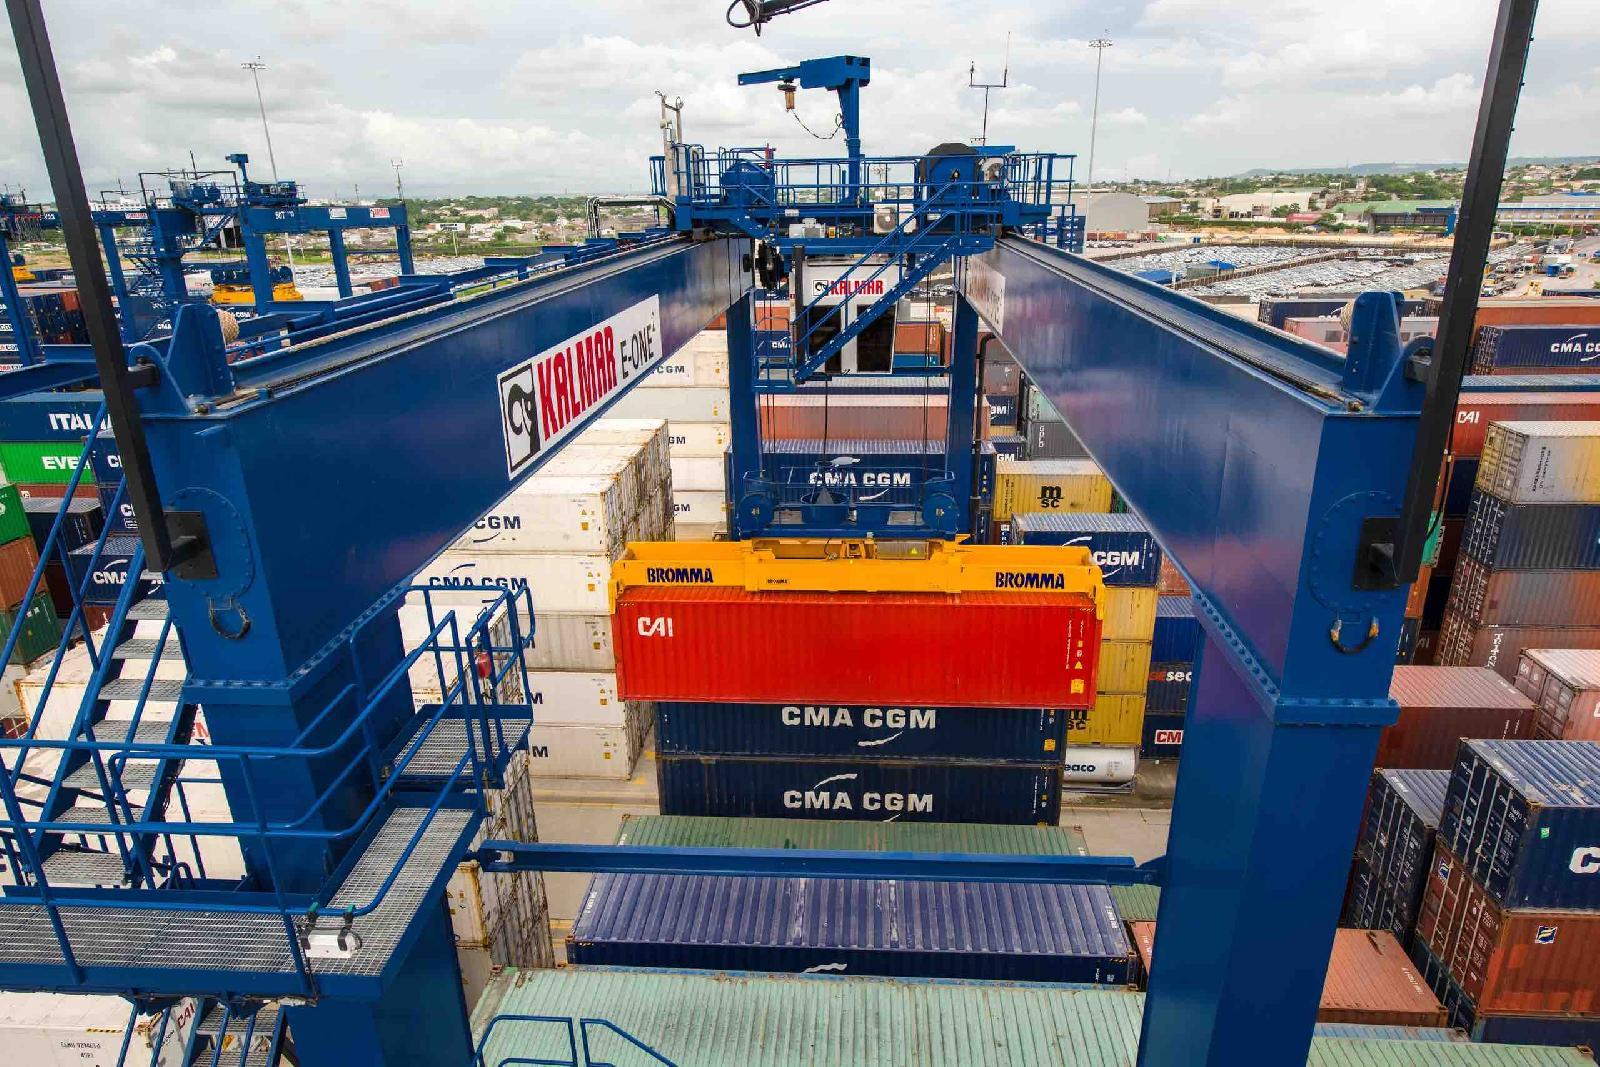 Kalmar wins order for 5 zero-emission RTGs as Gdynia terminal ups capacity